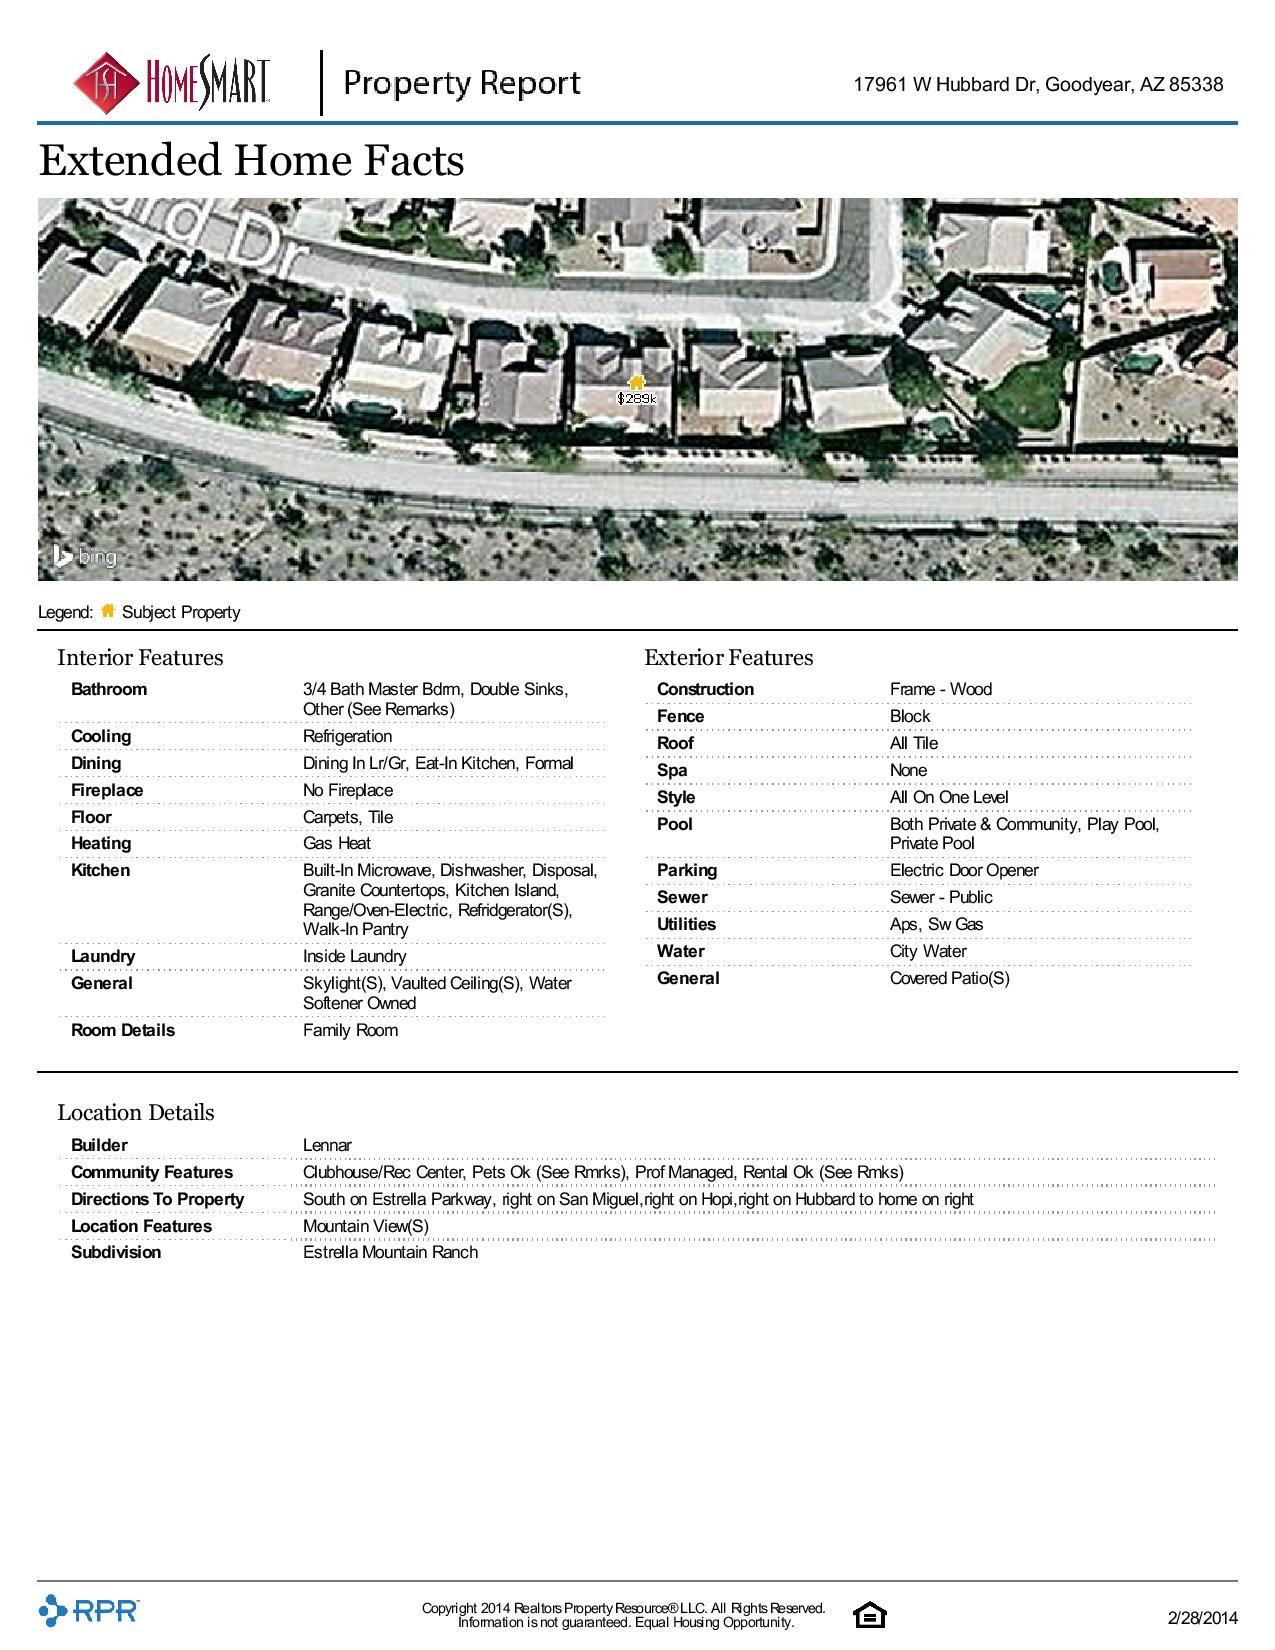 17961-W-Hubbard-Dr-Goodyear-AZ-85338-page-004